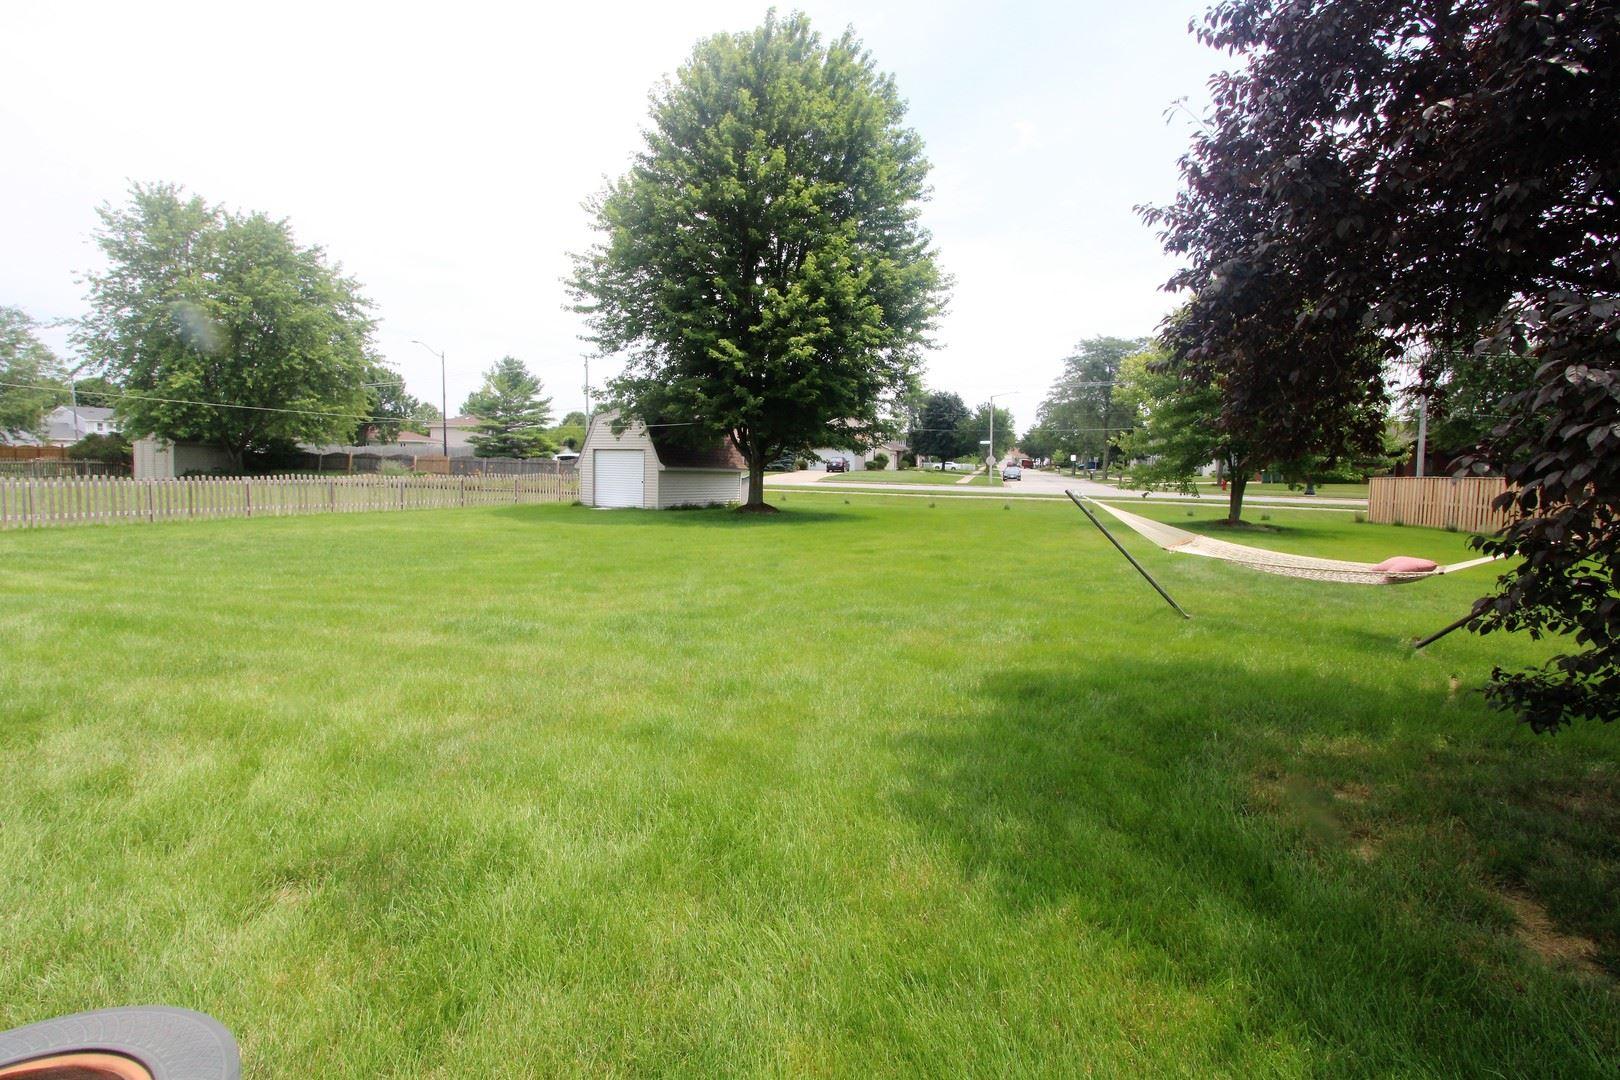 Photo of 200 Turnbridge Drive, Shorewood, IL 60404 (MLS # 11151785)